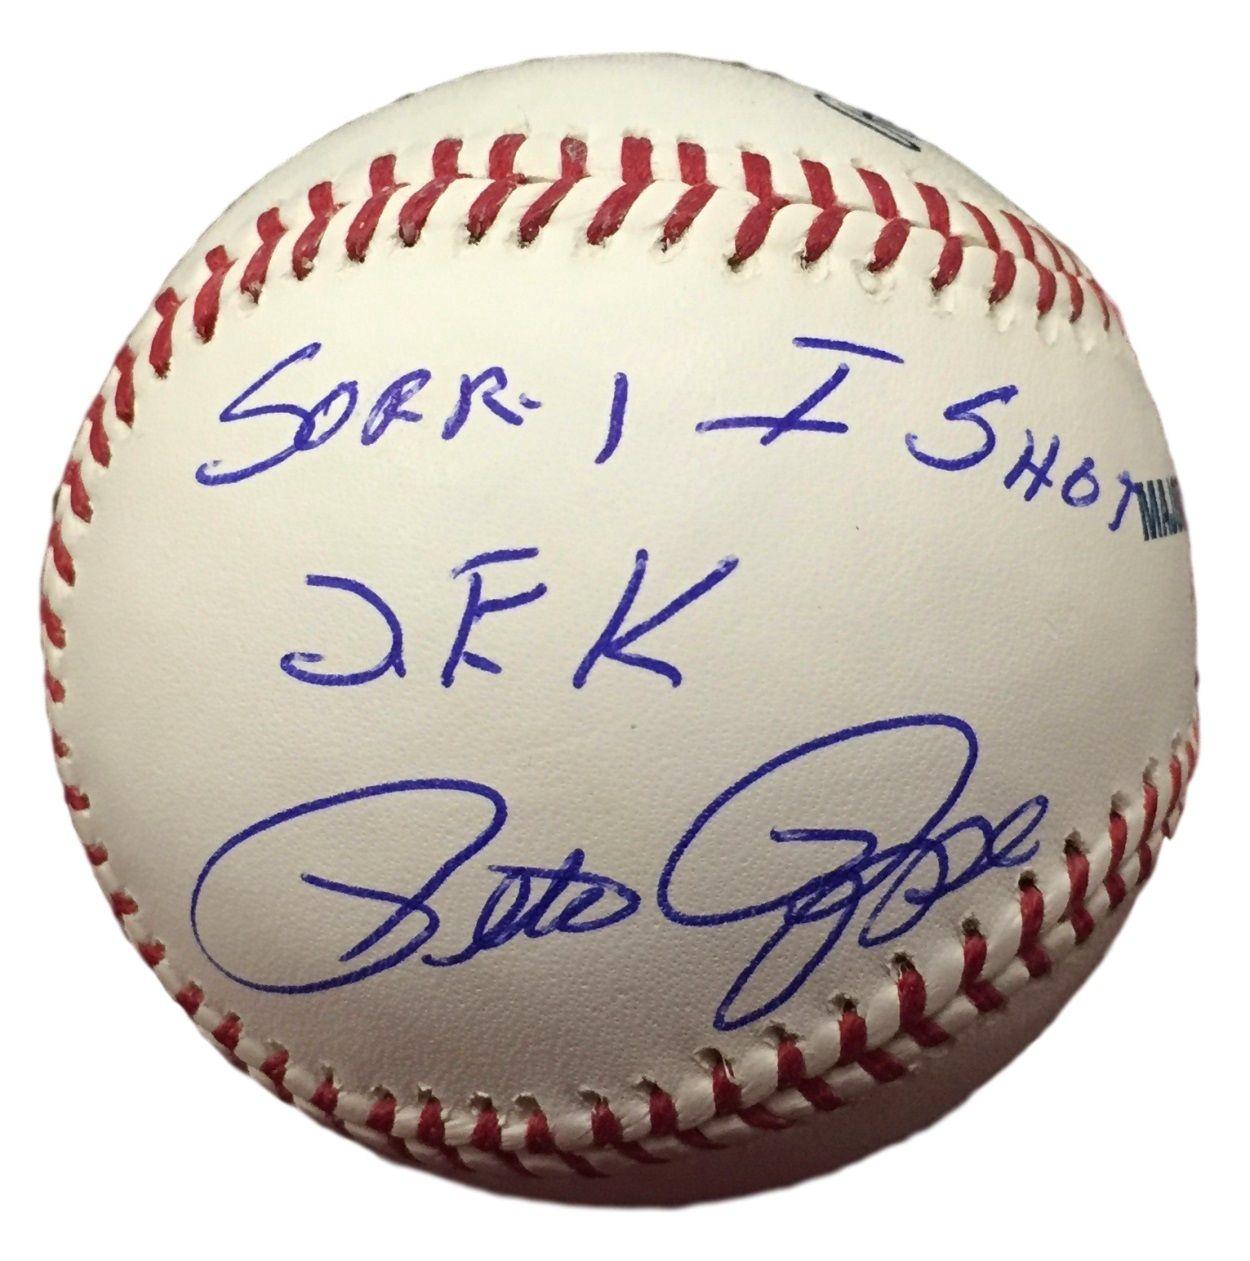 Pete Rose Phillies Signed Mlb Baseball Sorry I Shot J F K Jsa Itp Phillies Pete Rose Mlb Baseball